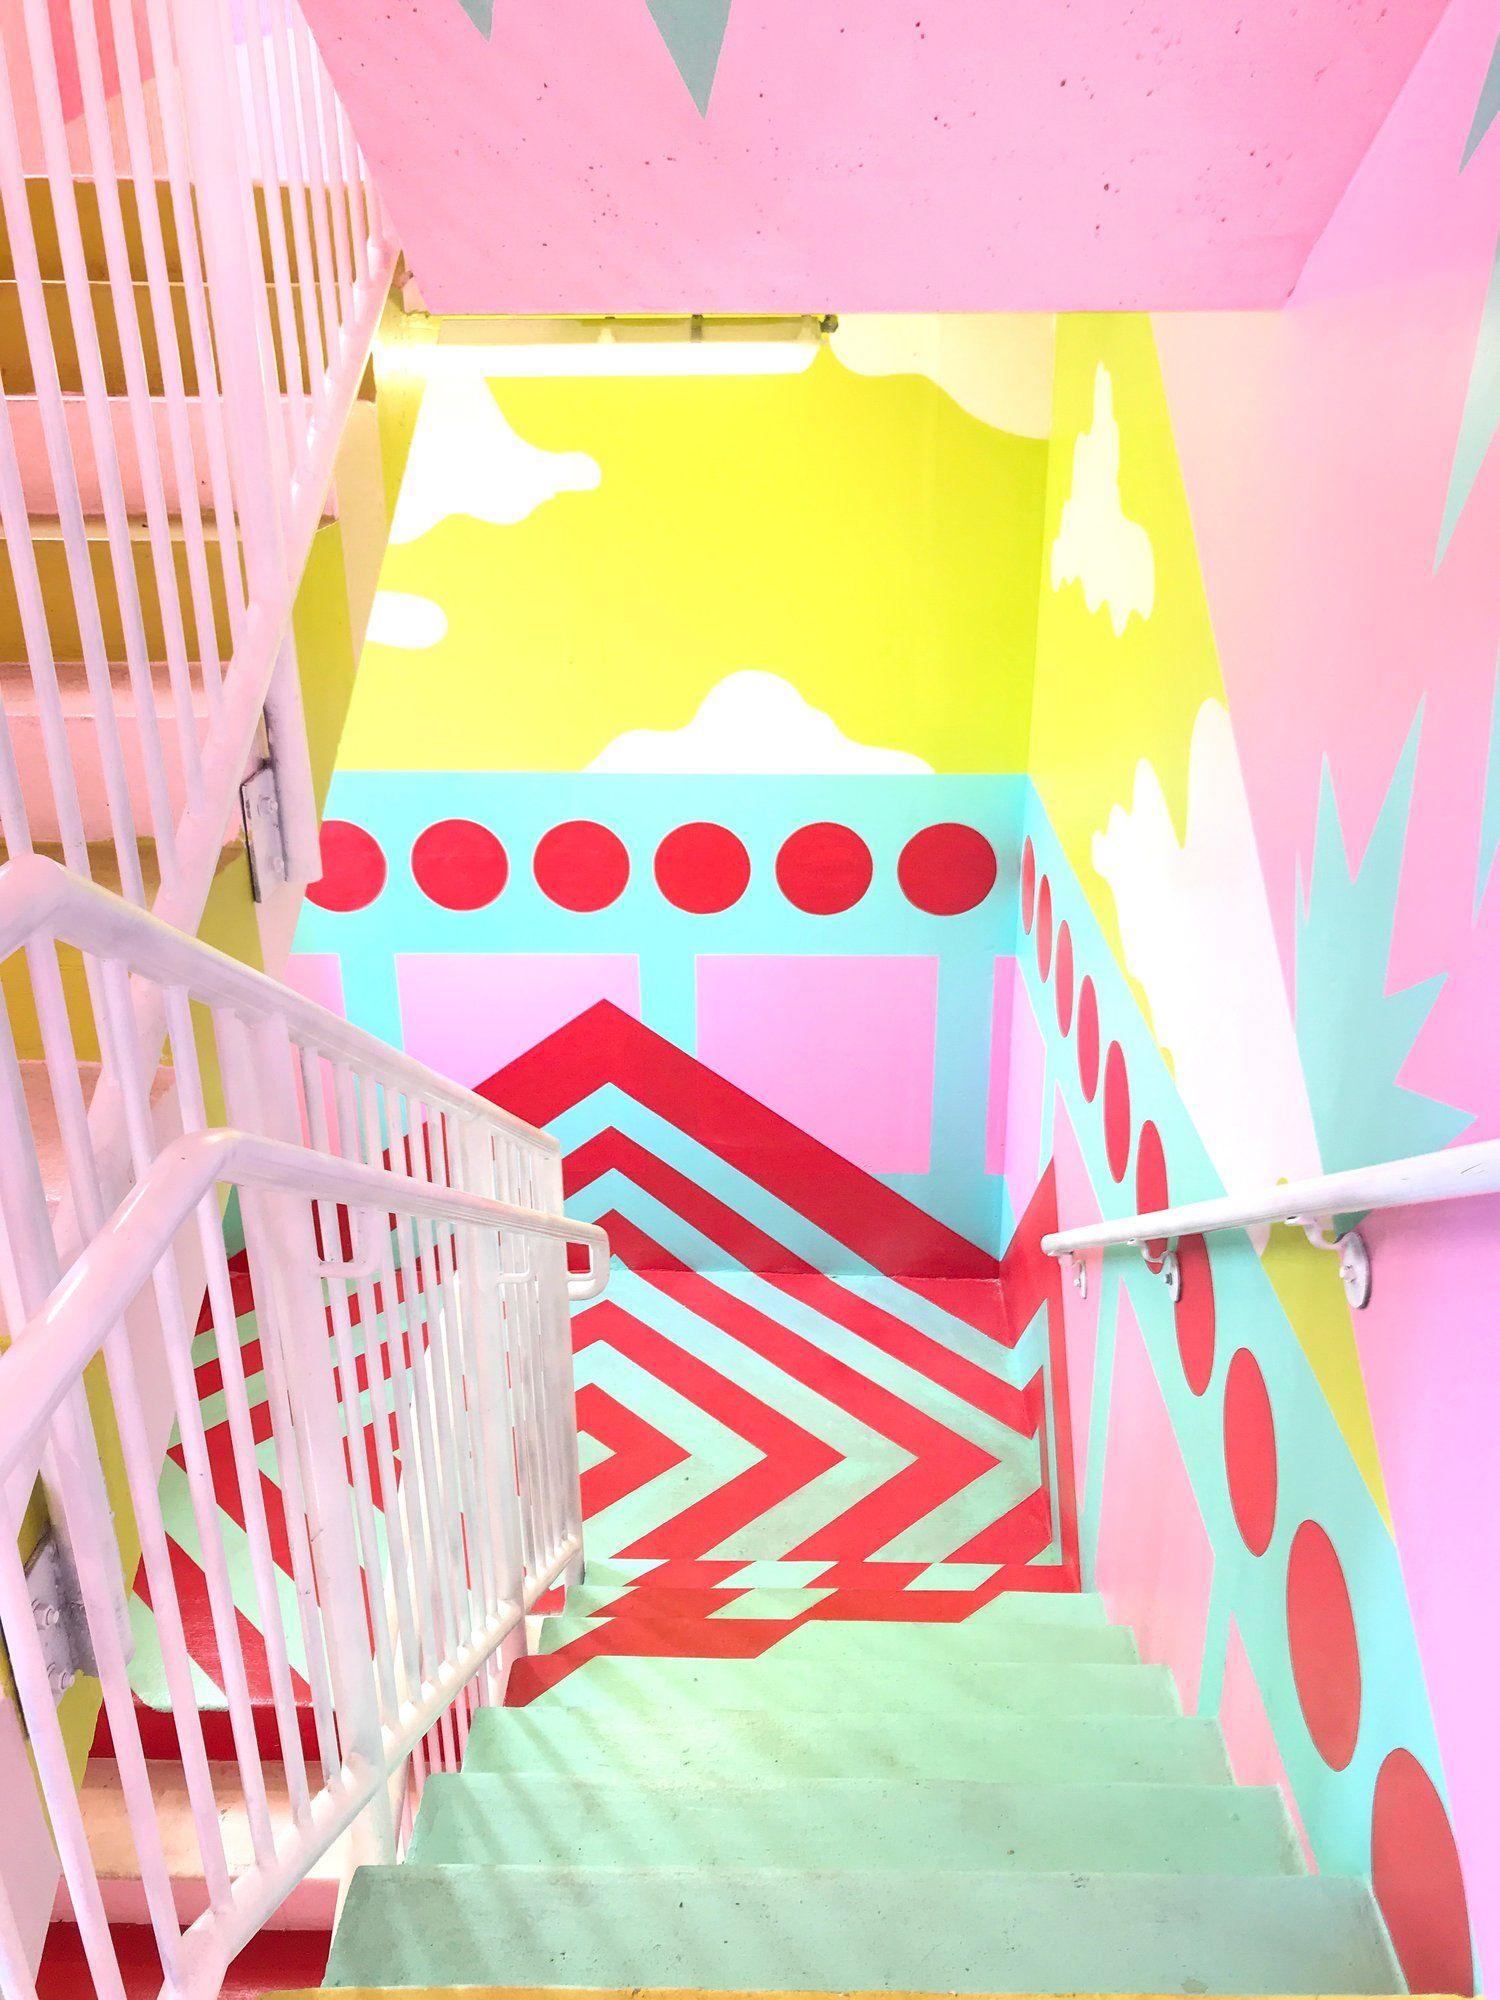 Miami Museum of Ice Cream - Tour & Video | Diseños en paredes ...